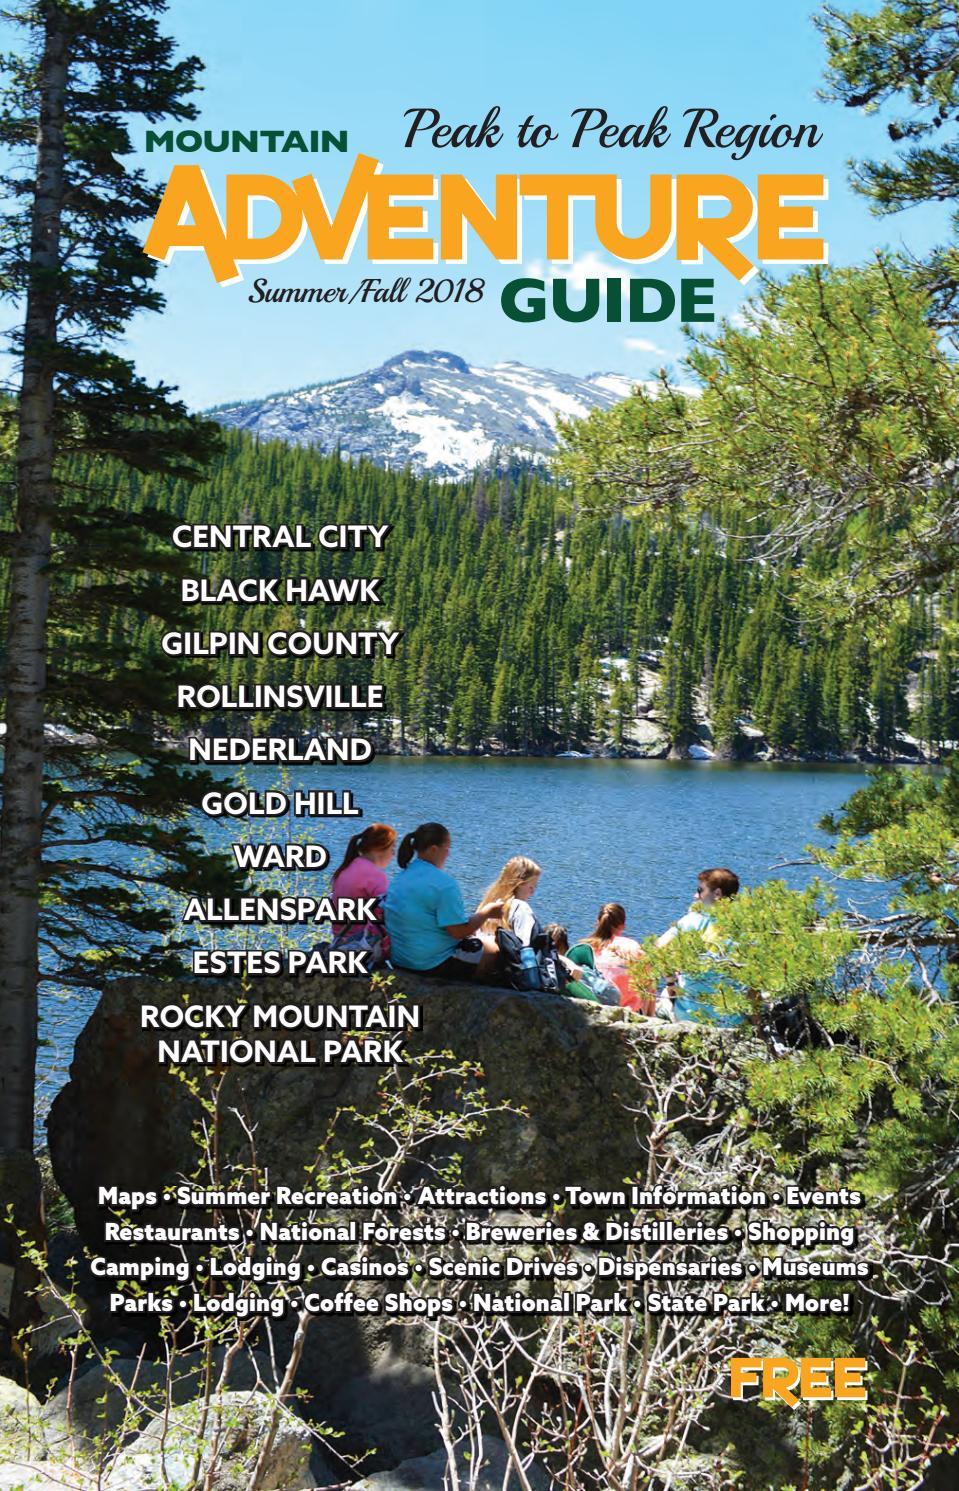 Mountain Adventure Guide - Peak to Peak Region: Summer/Fall